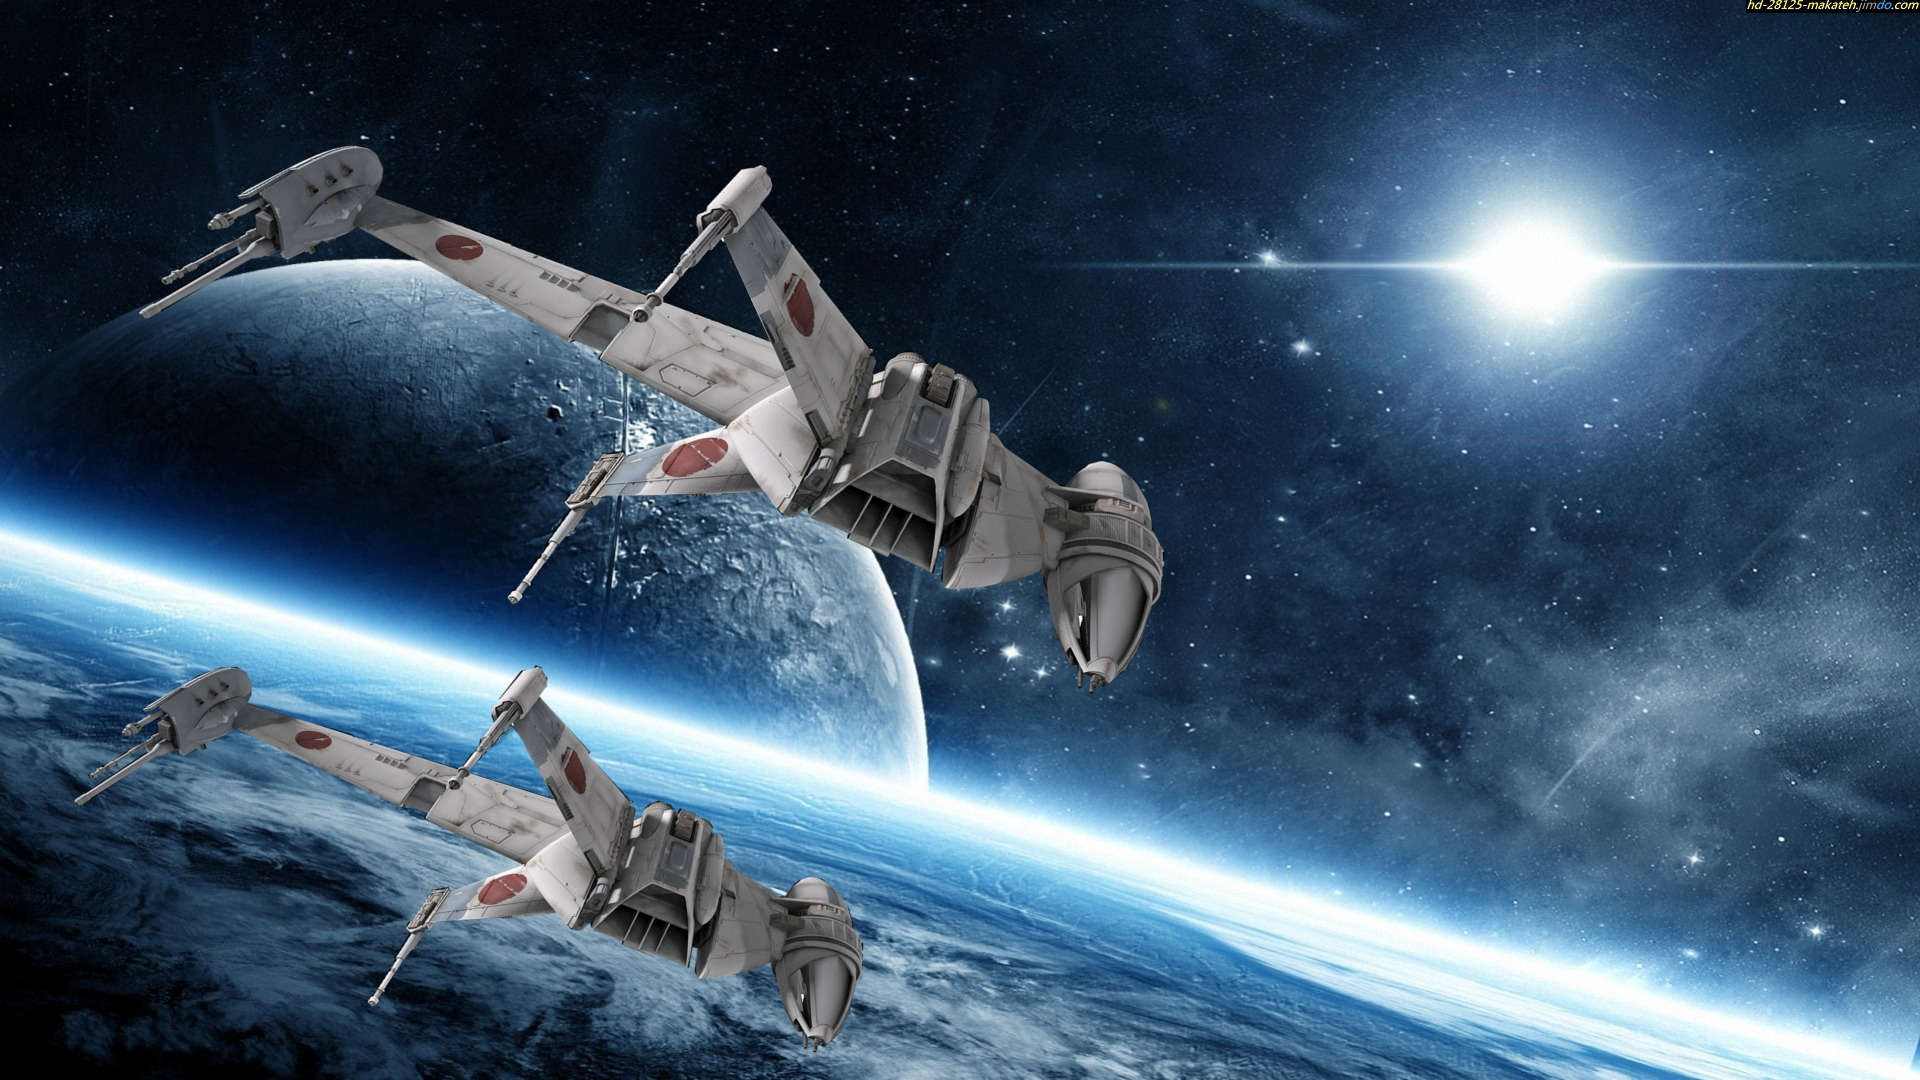 Wars Space Battle Wallpaper 1920x1080 Boba Fett Wallpaper 1920x1080 1920x1080